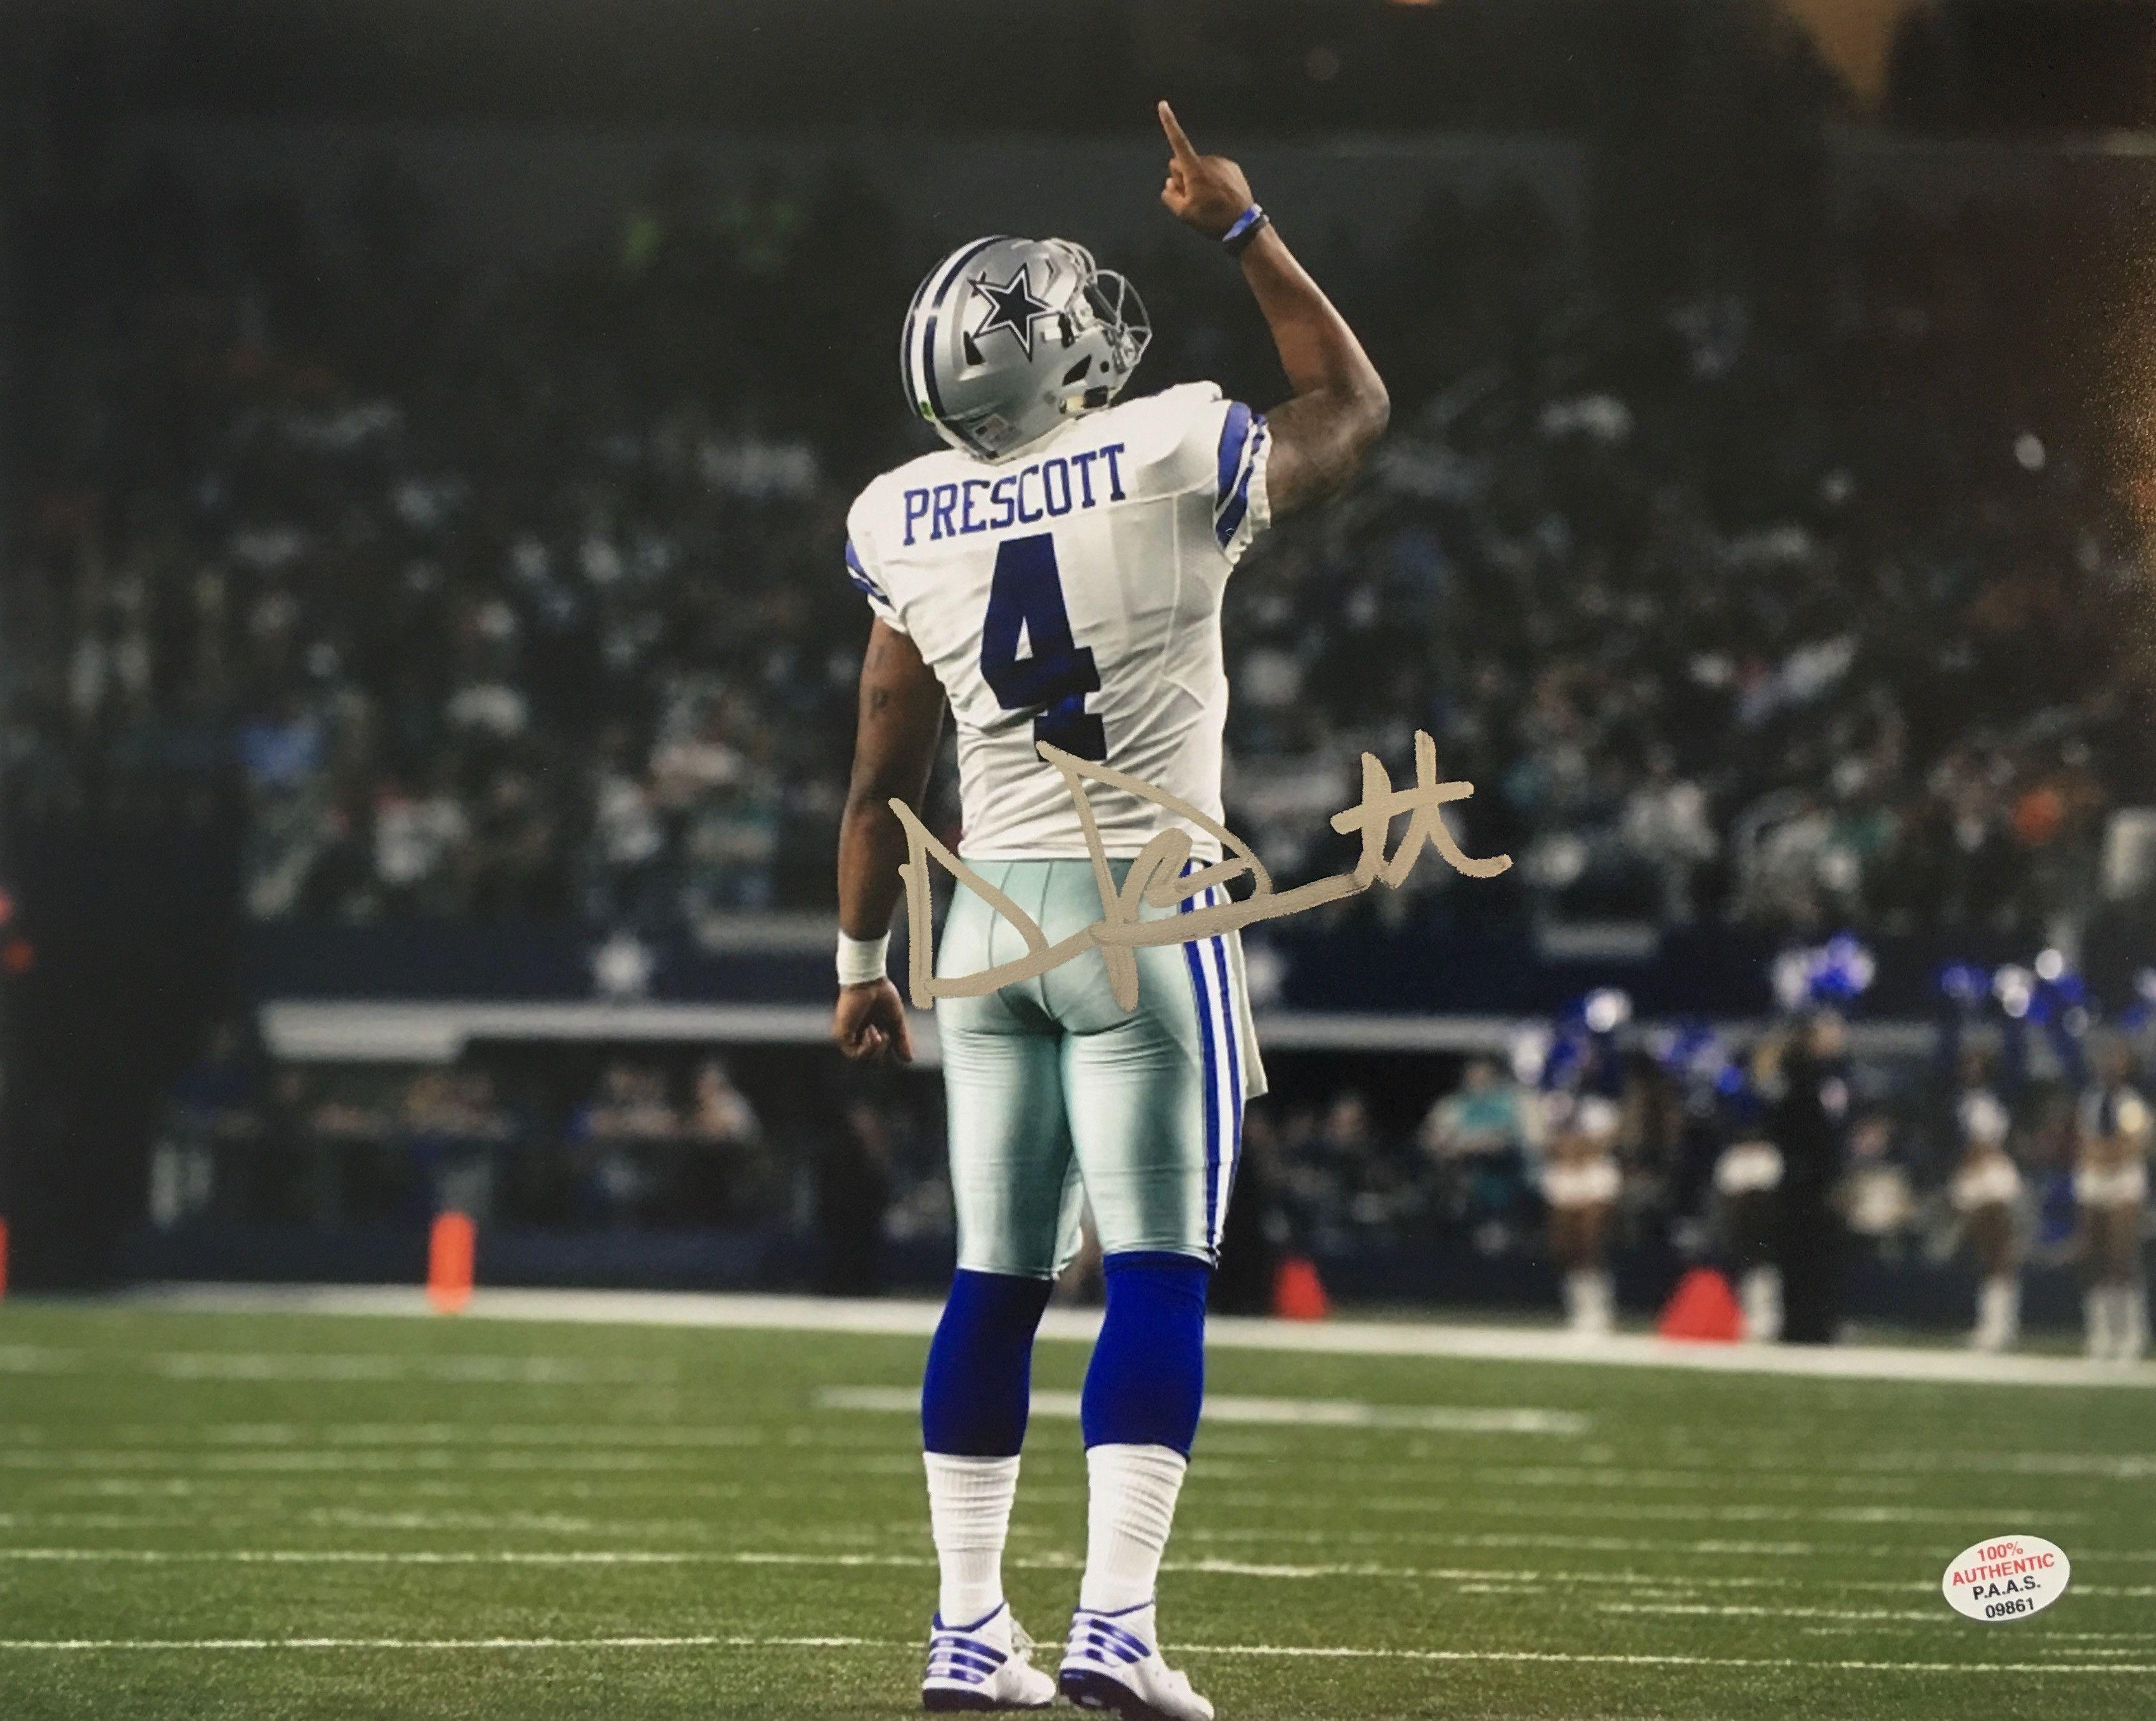 Dak Prescott Dallas Cowboys Rookie Signed 8x10 Photo Dallas Cowboys Dak Prescott Dallas Cowboys Dallas